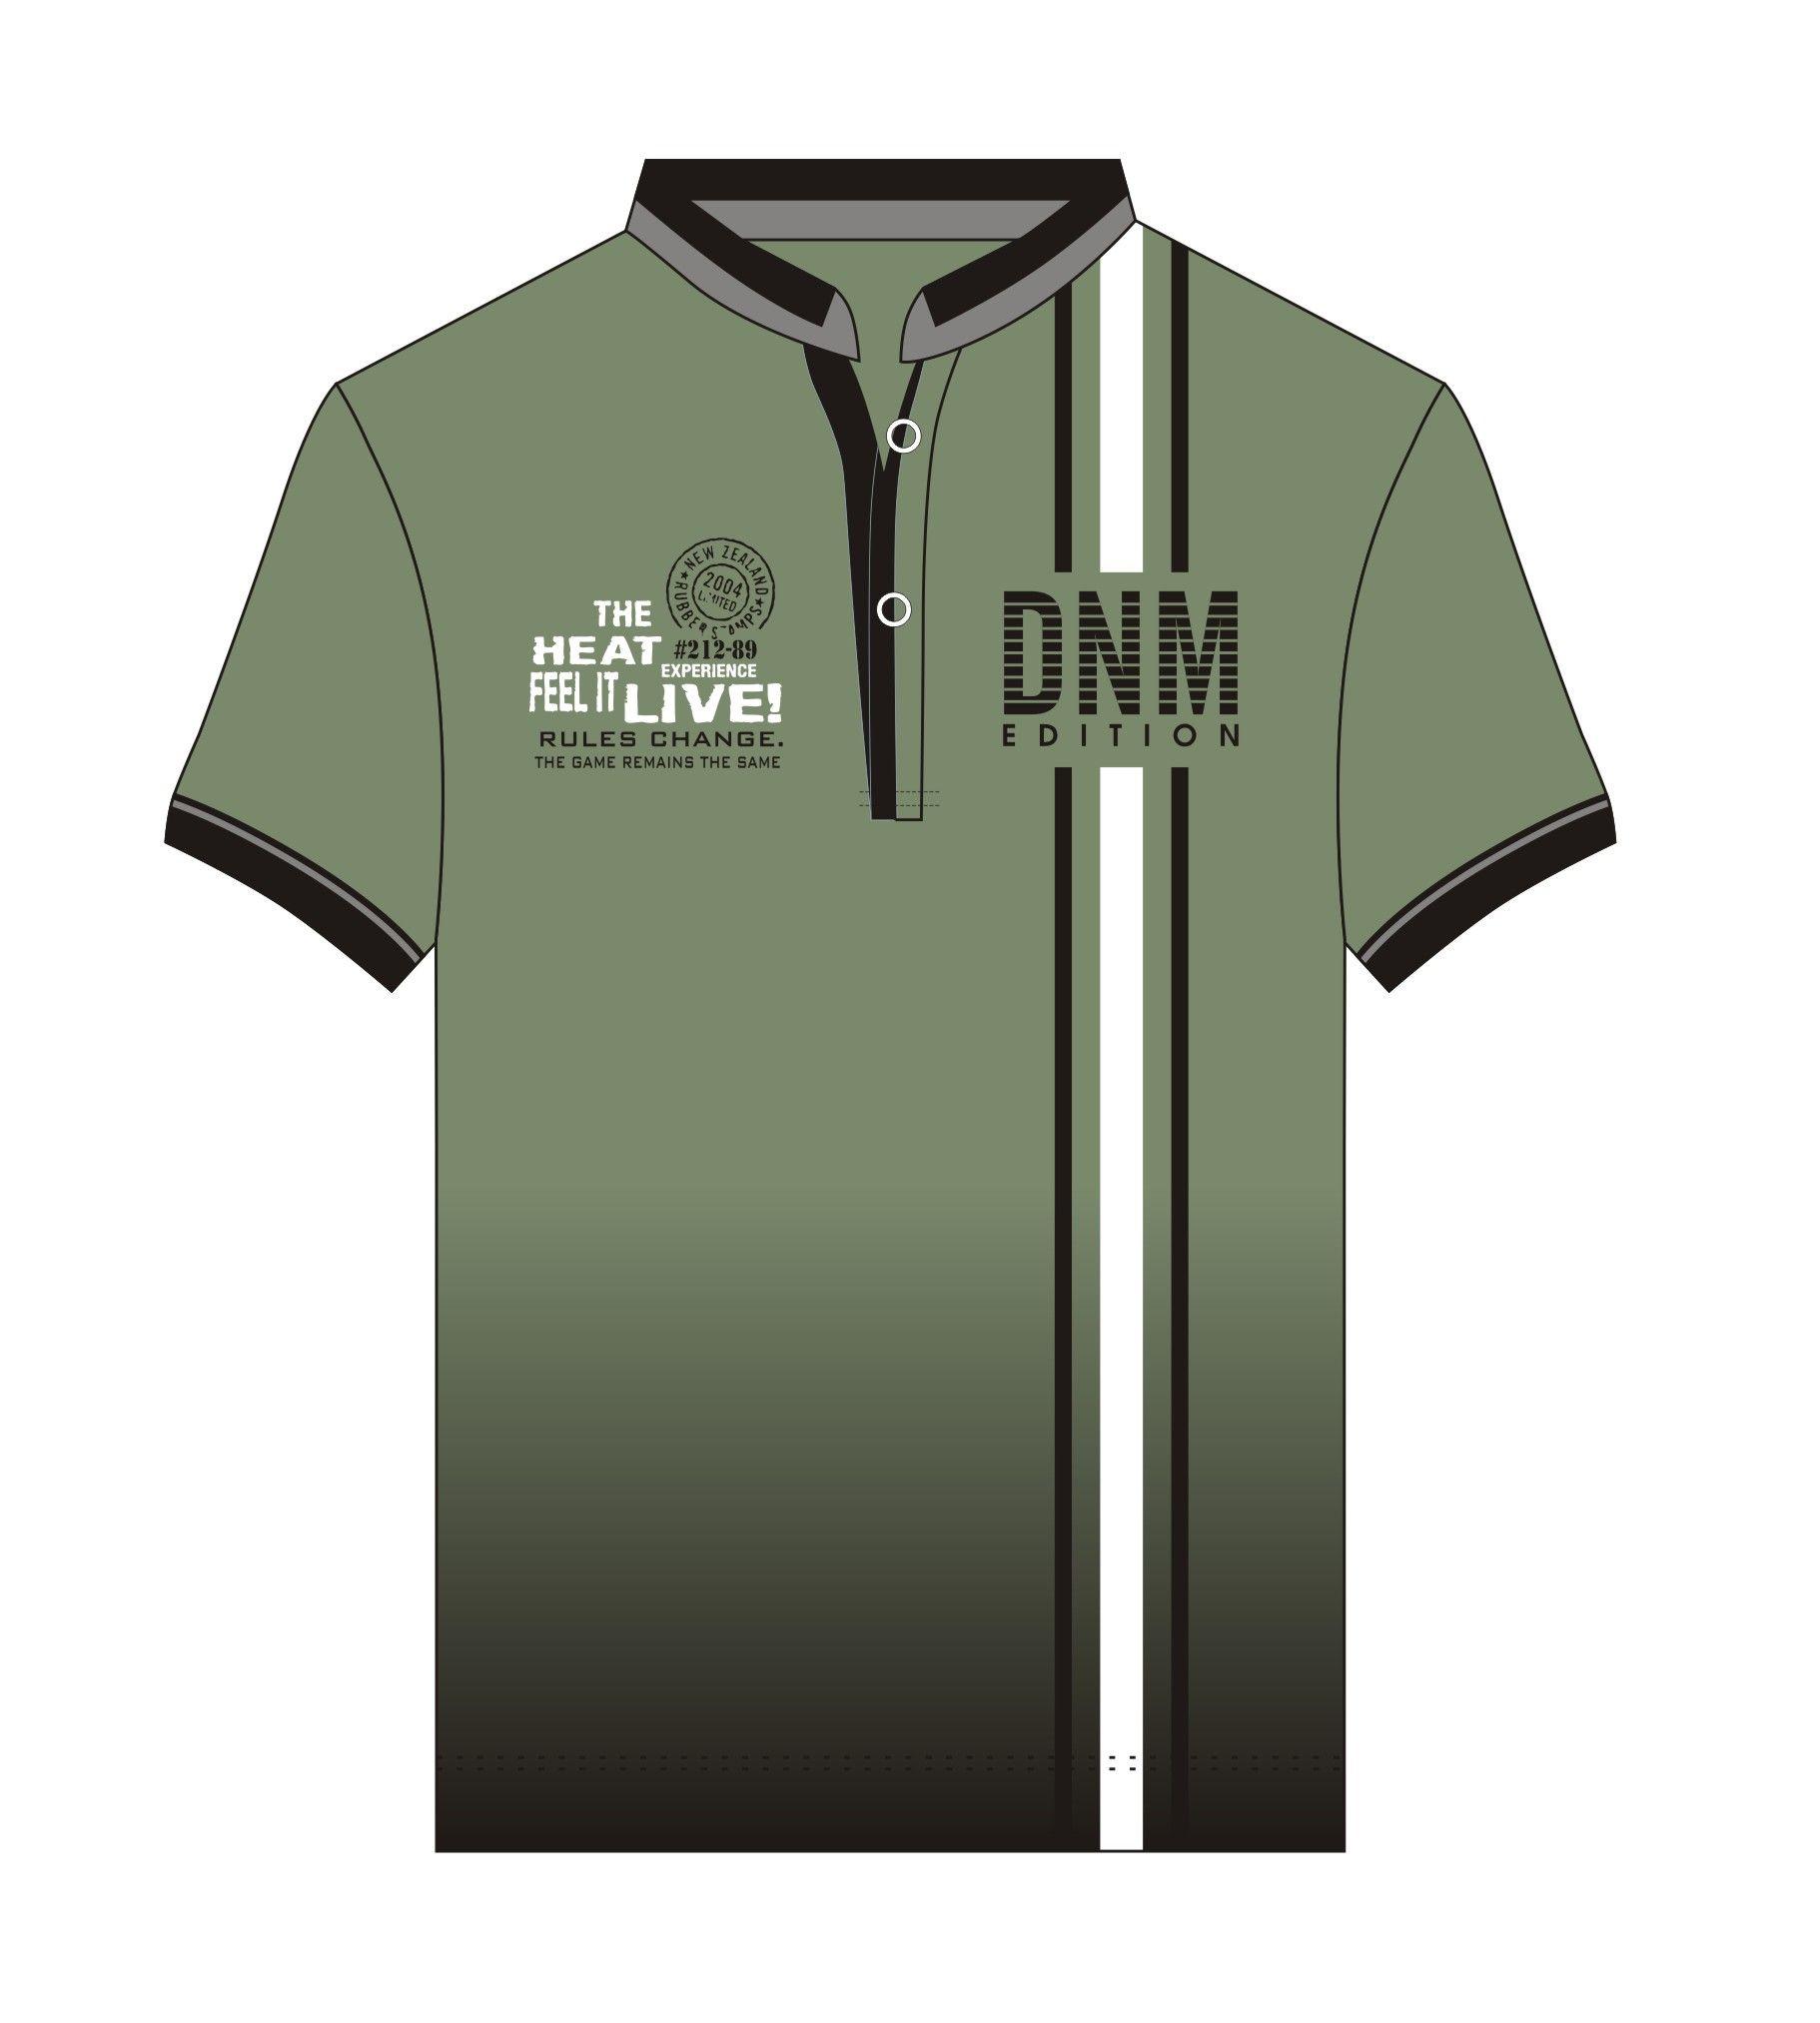 Download Design We Make Gents T Shirts Shirt Designs New T Shirt Design